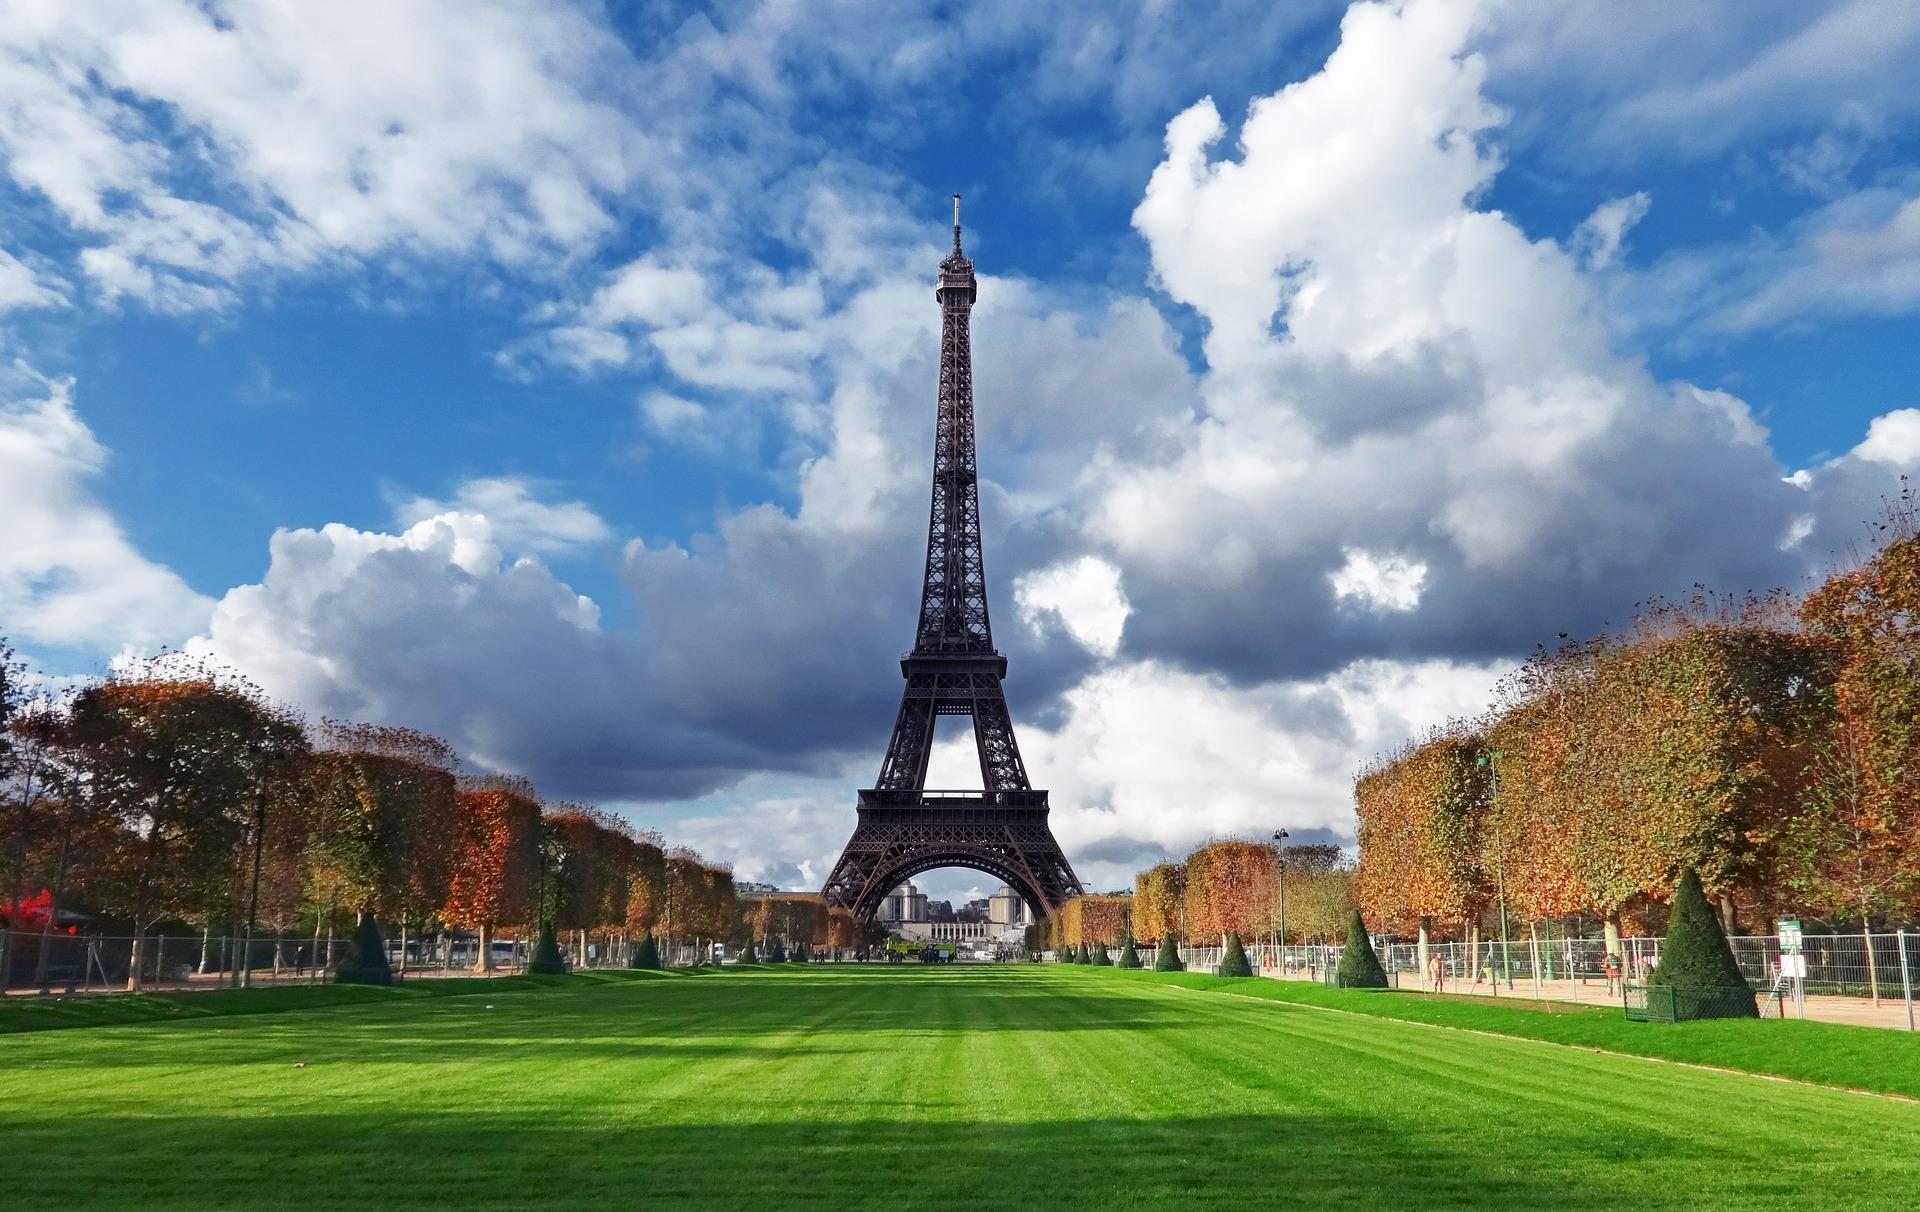 paris airport to eiffel tower